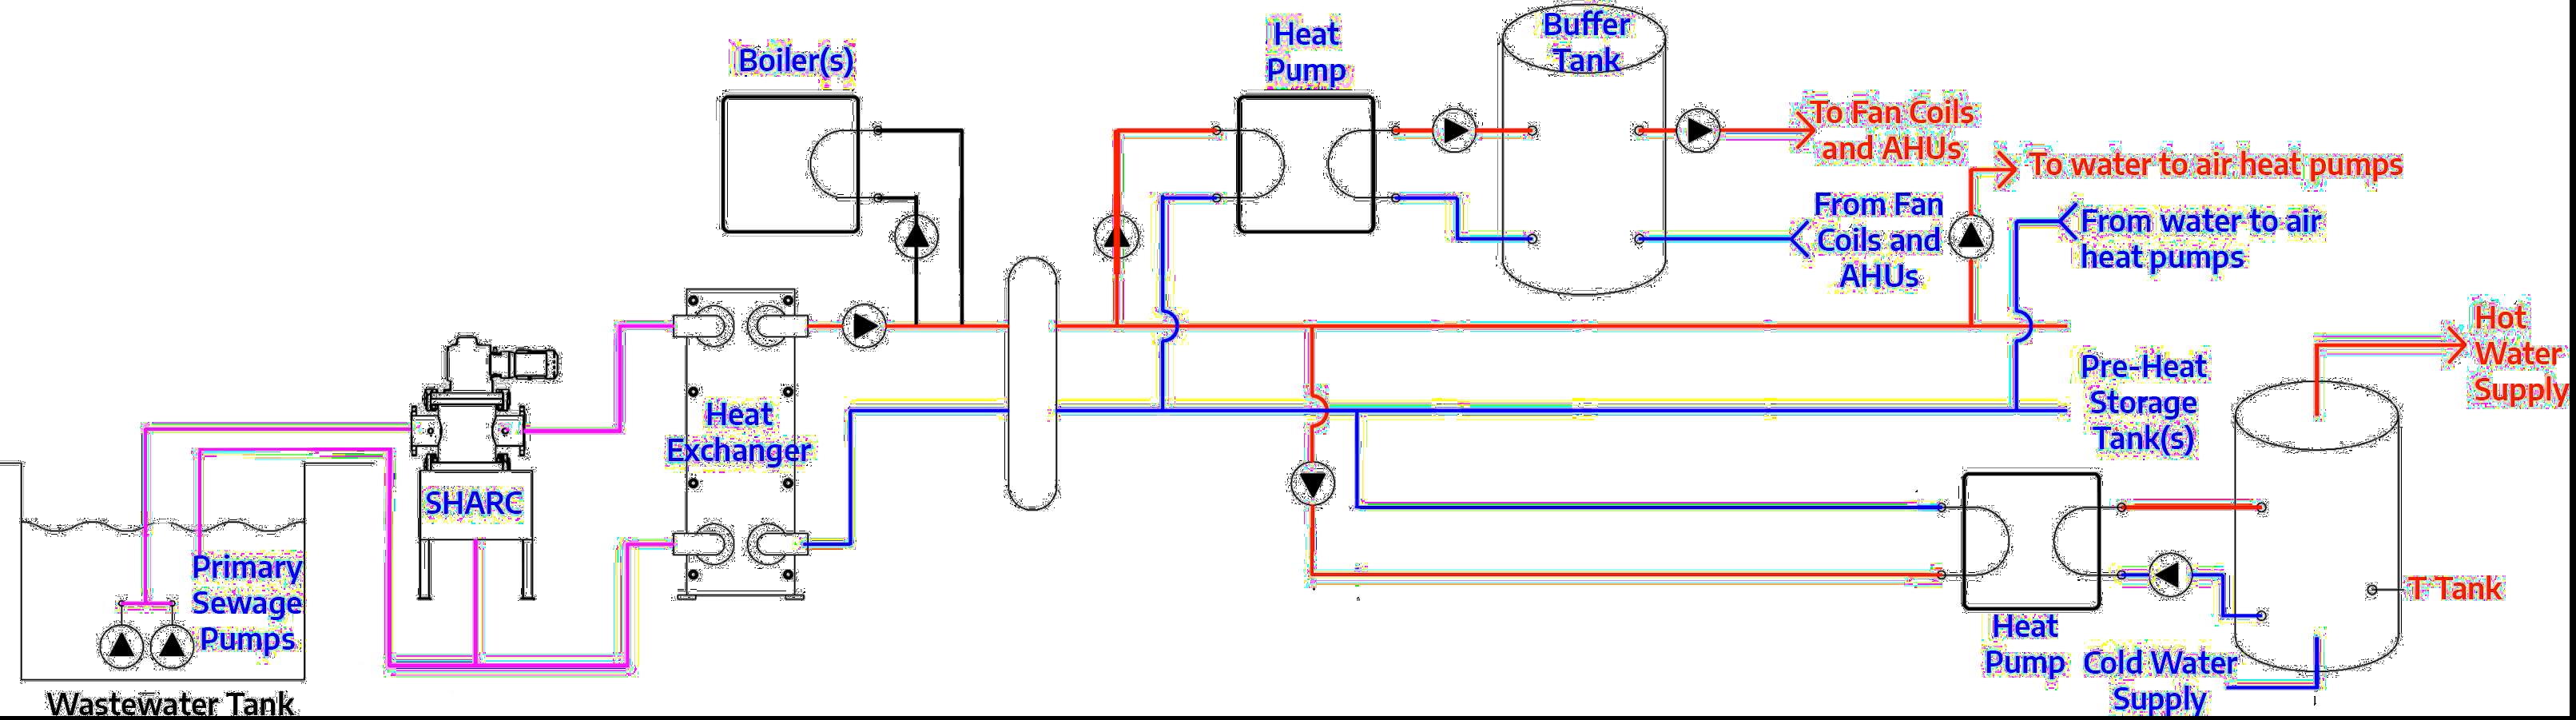 SHARC Line Diagram